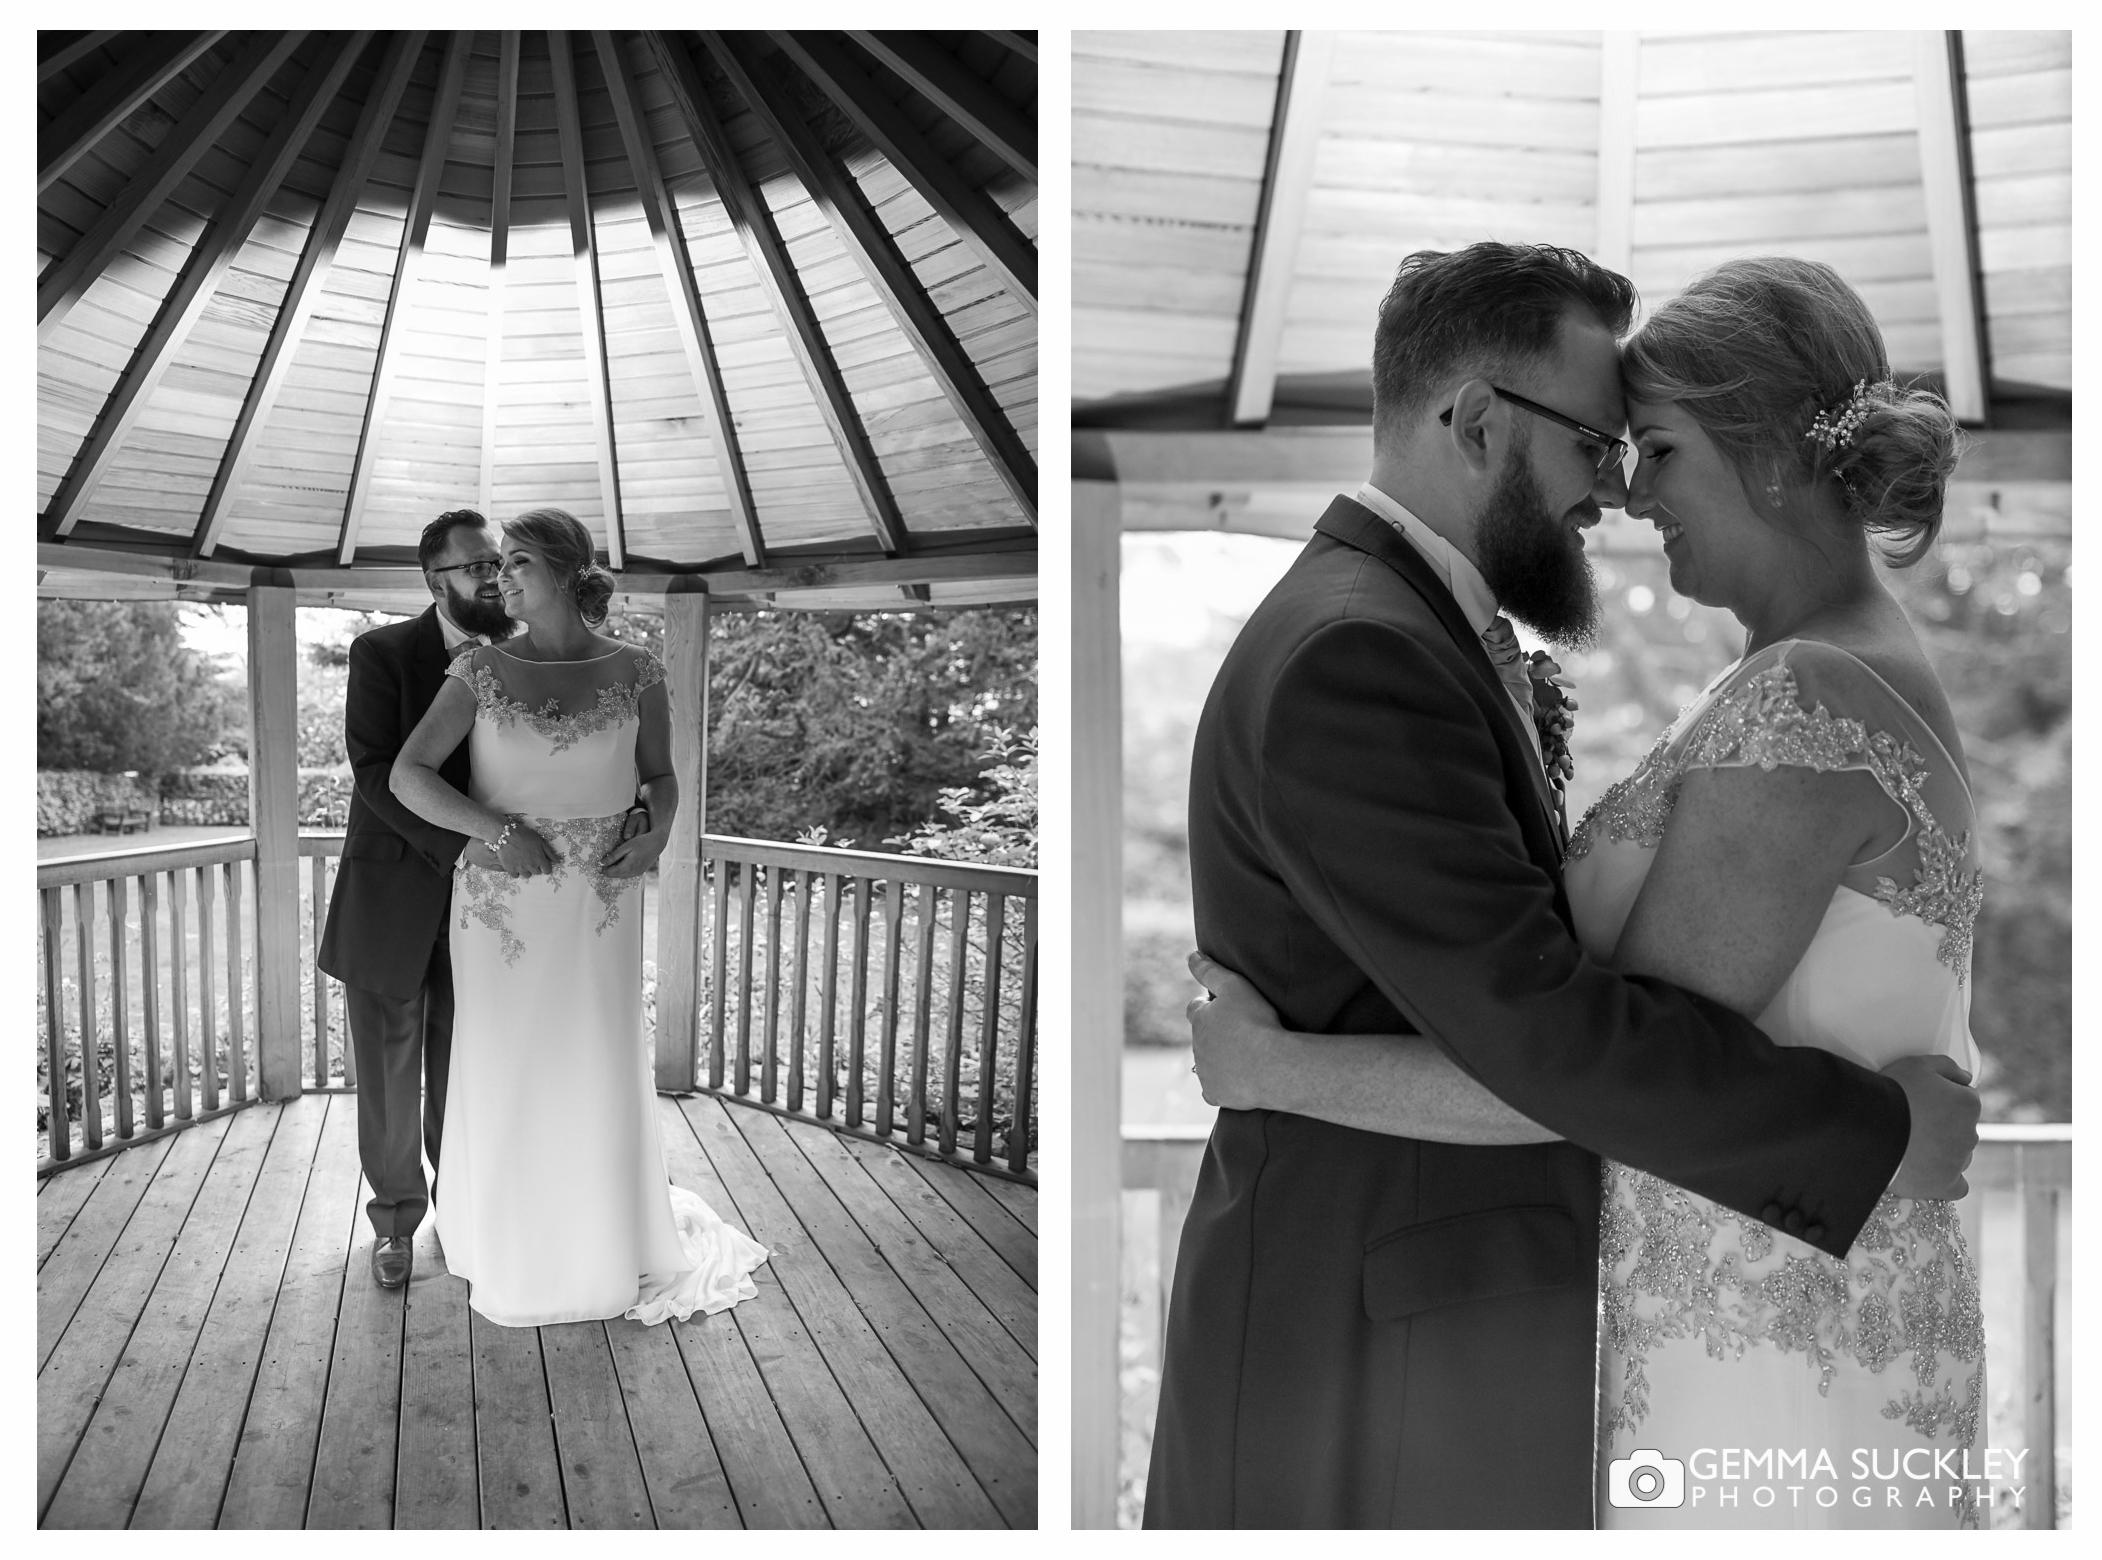 the-old-swan-wedding©gemmasuckleyphotography.jpg